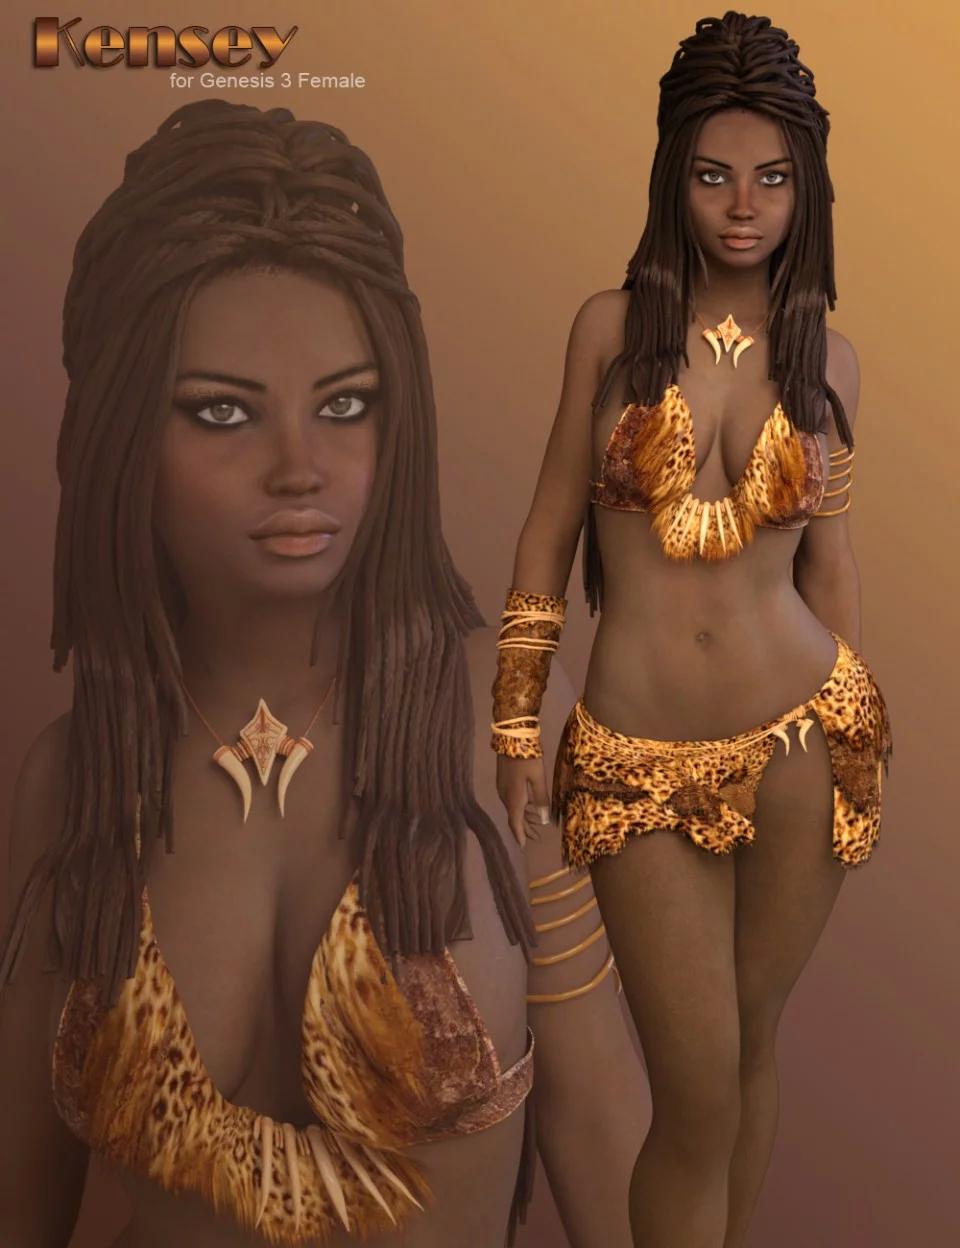 P3D Kensey for Genesis 3 Female